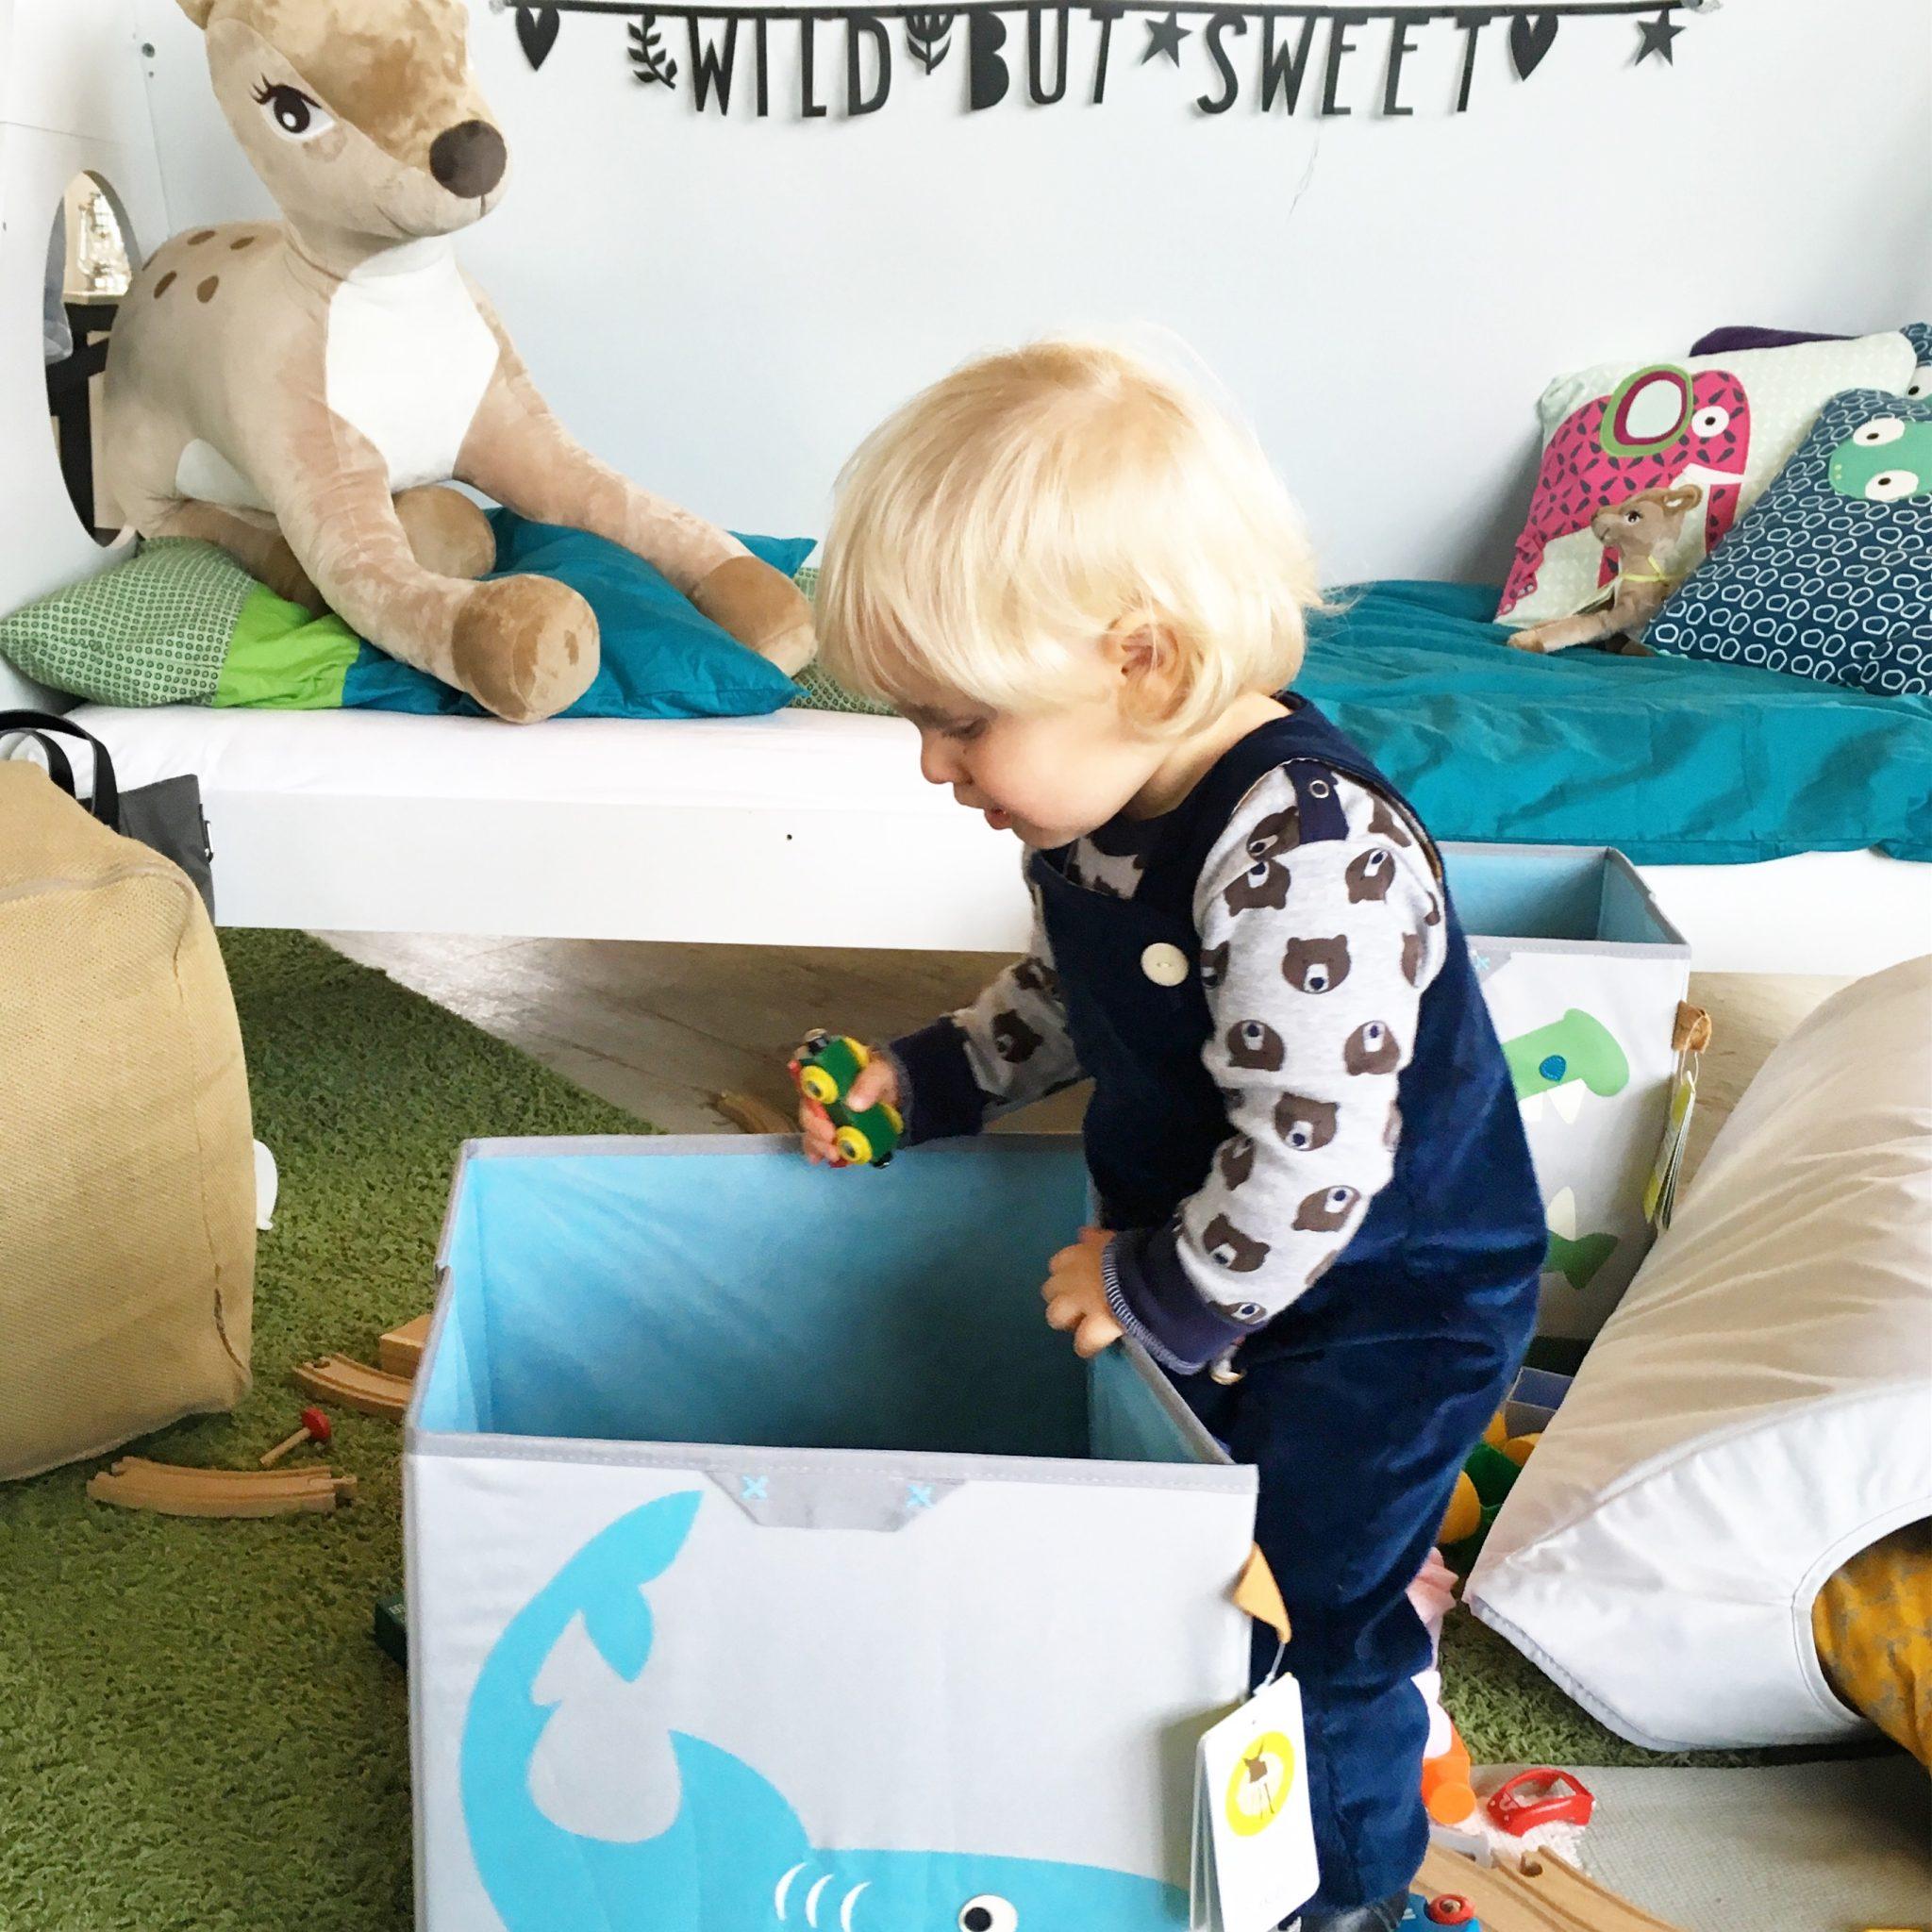 aufraeumen mit kindern laessig system3 sarahplusdrei. Black Bedroom Furniture Sets. Home Design Ideas